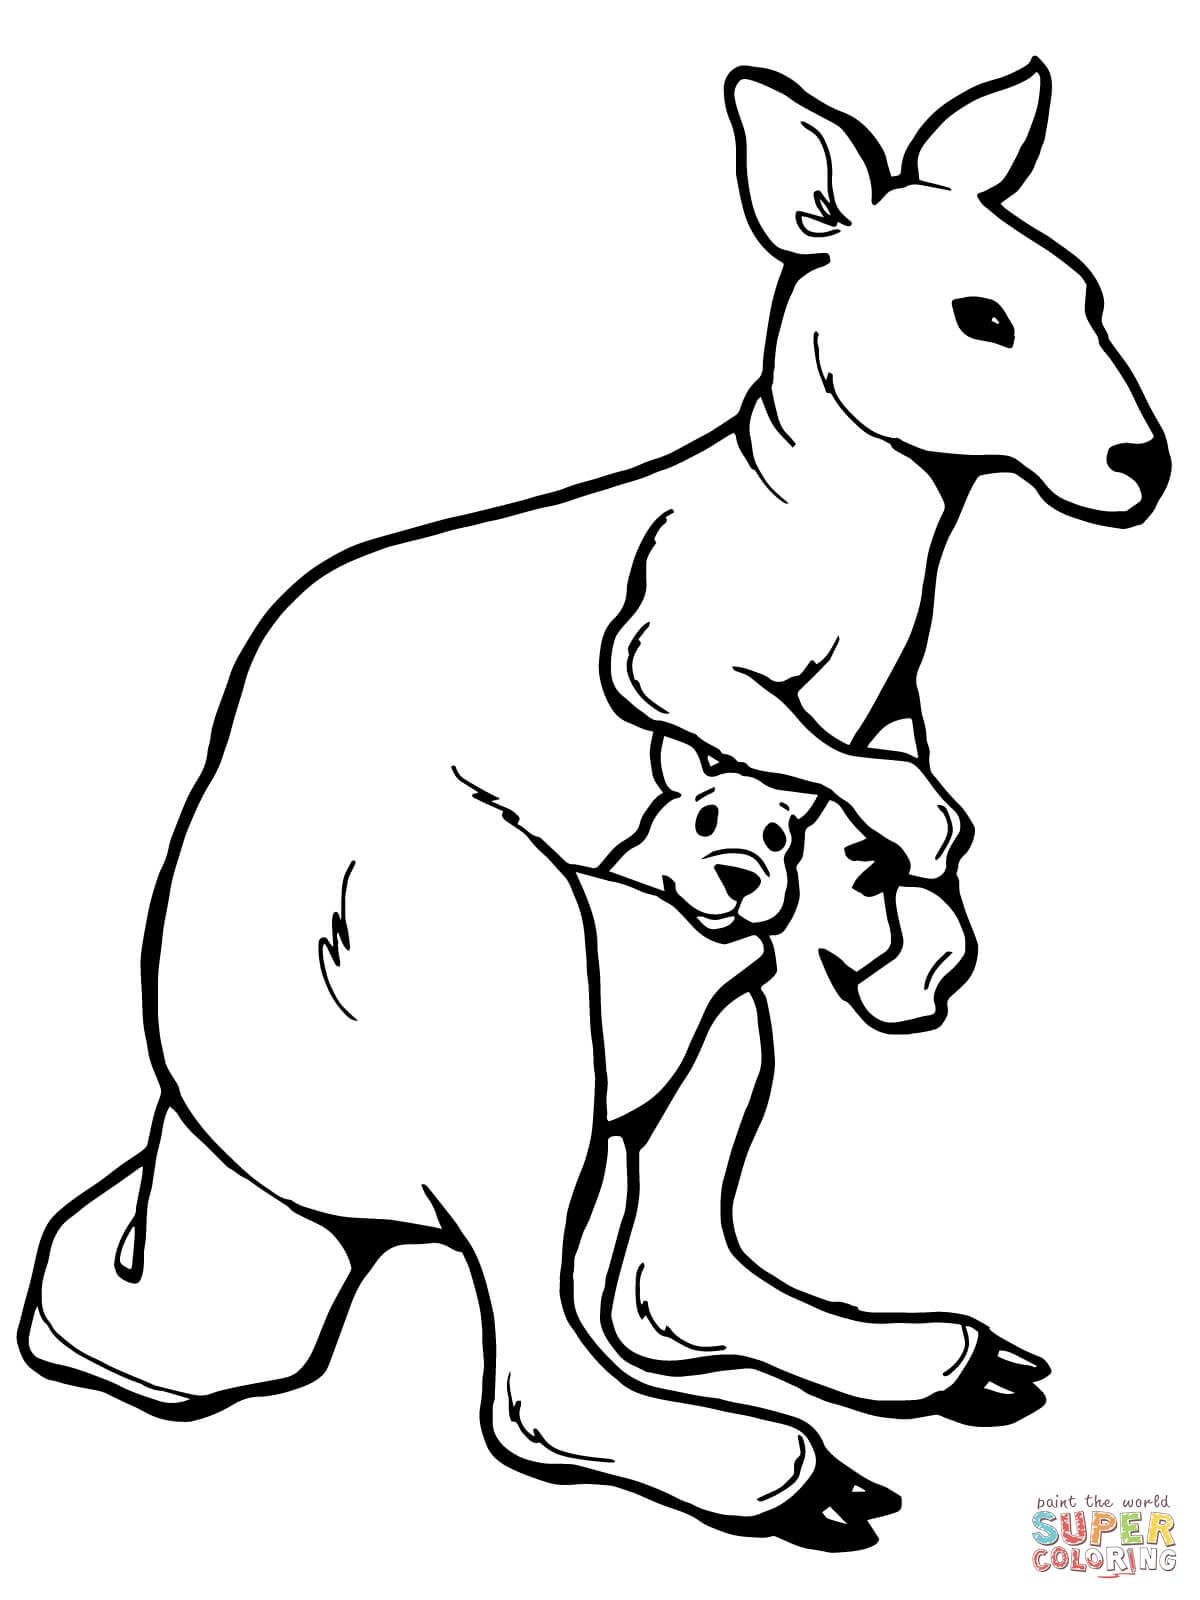 Kangaroo Drawing For Kids At Getdrawings